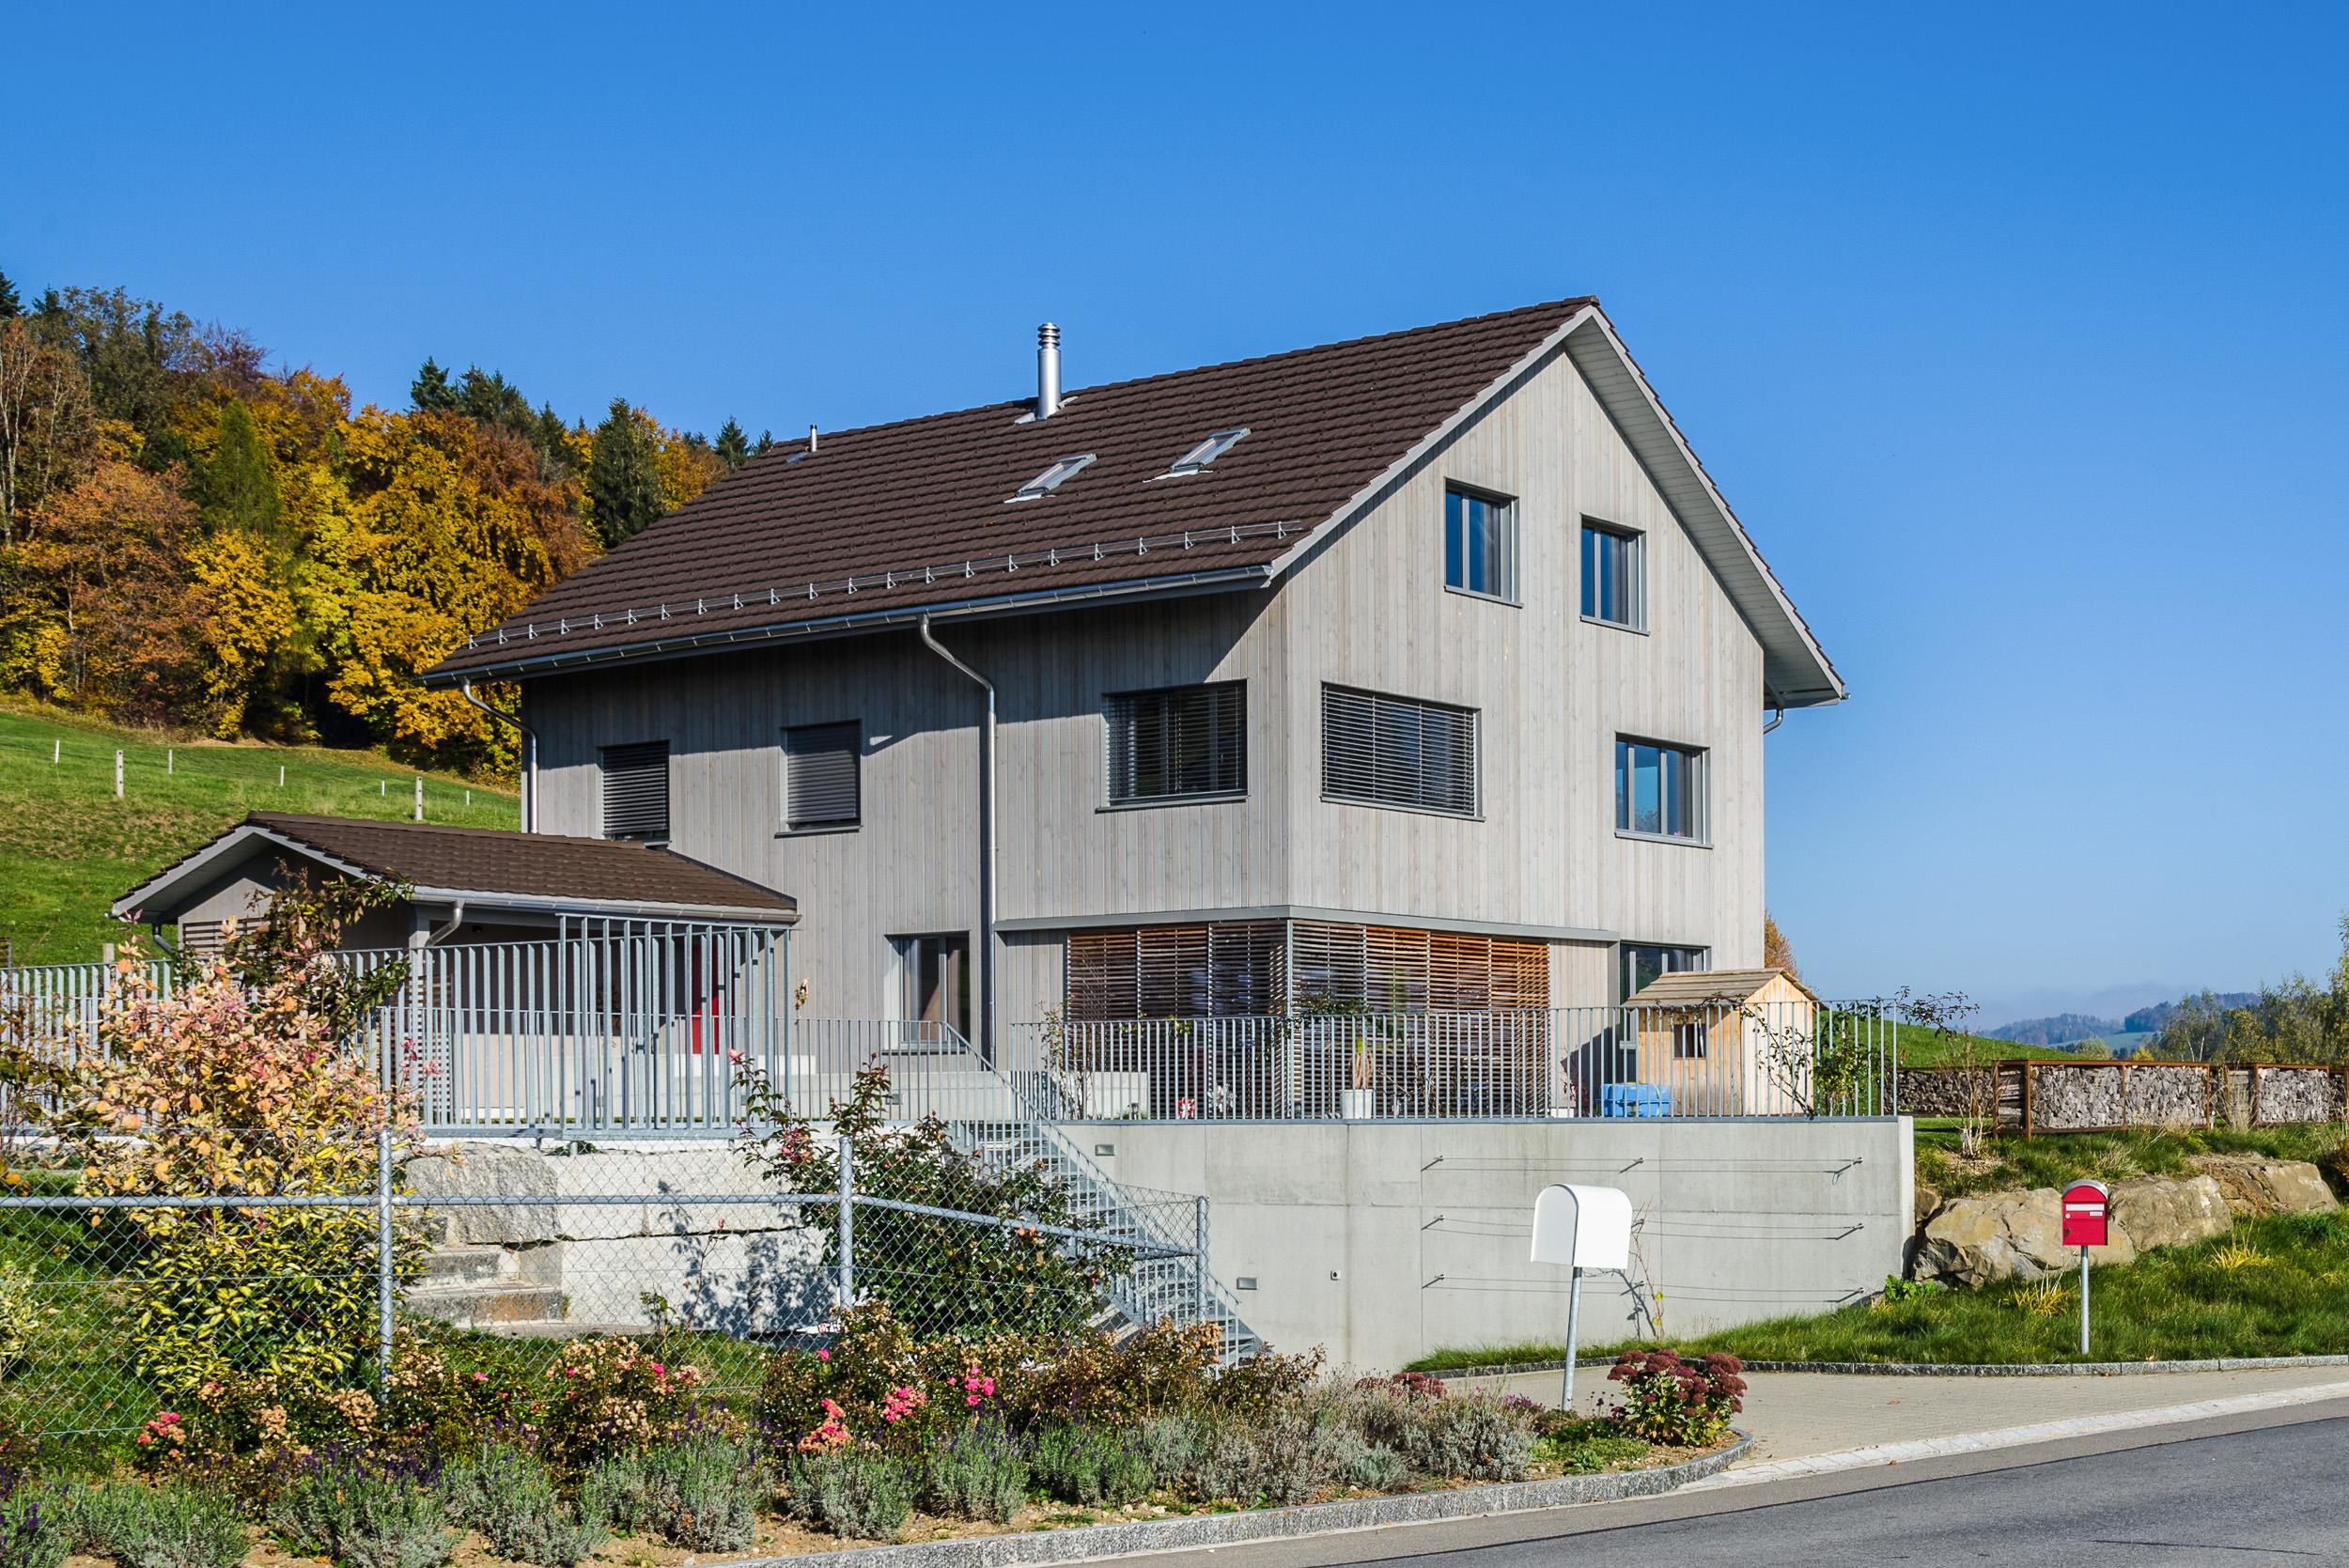 Neubau einfamilienhaus isikon schindler scheibling ag for Neubau einfamilienhaus